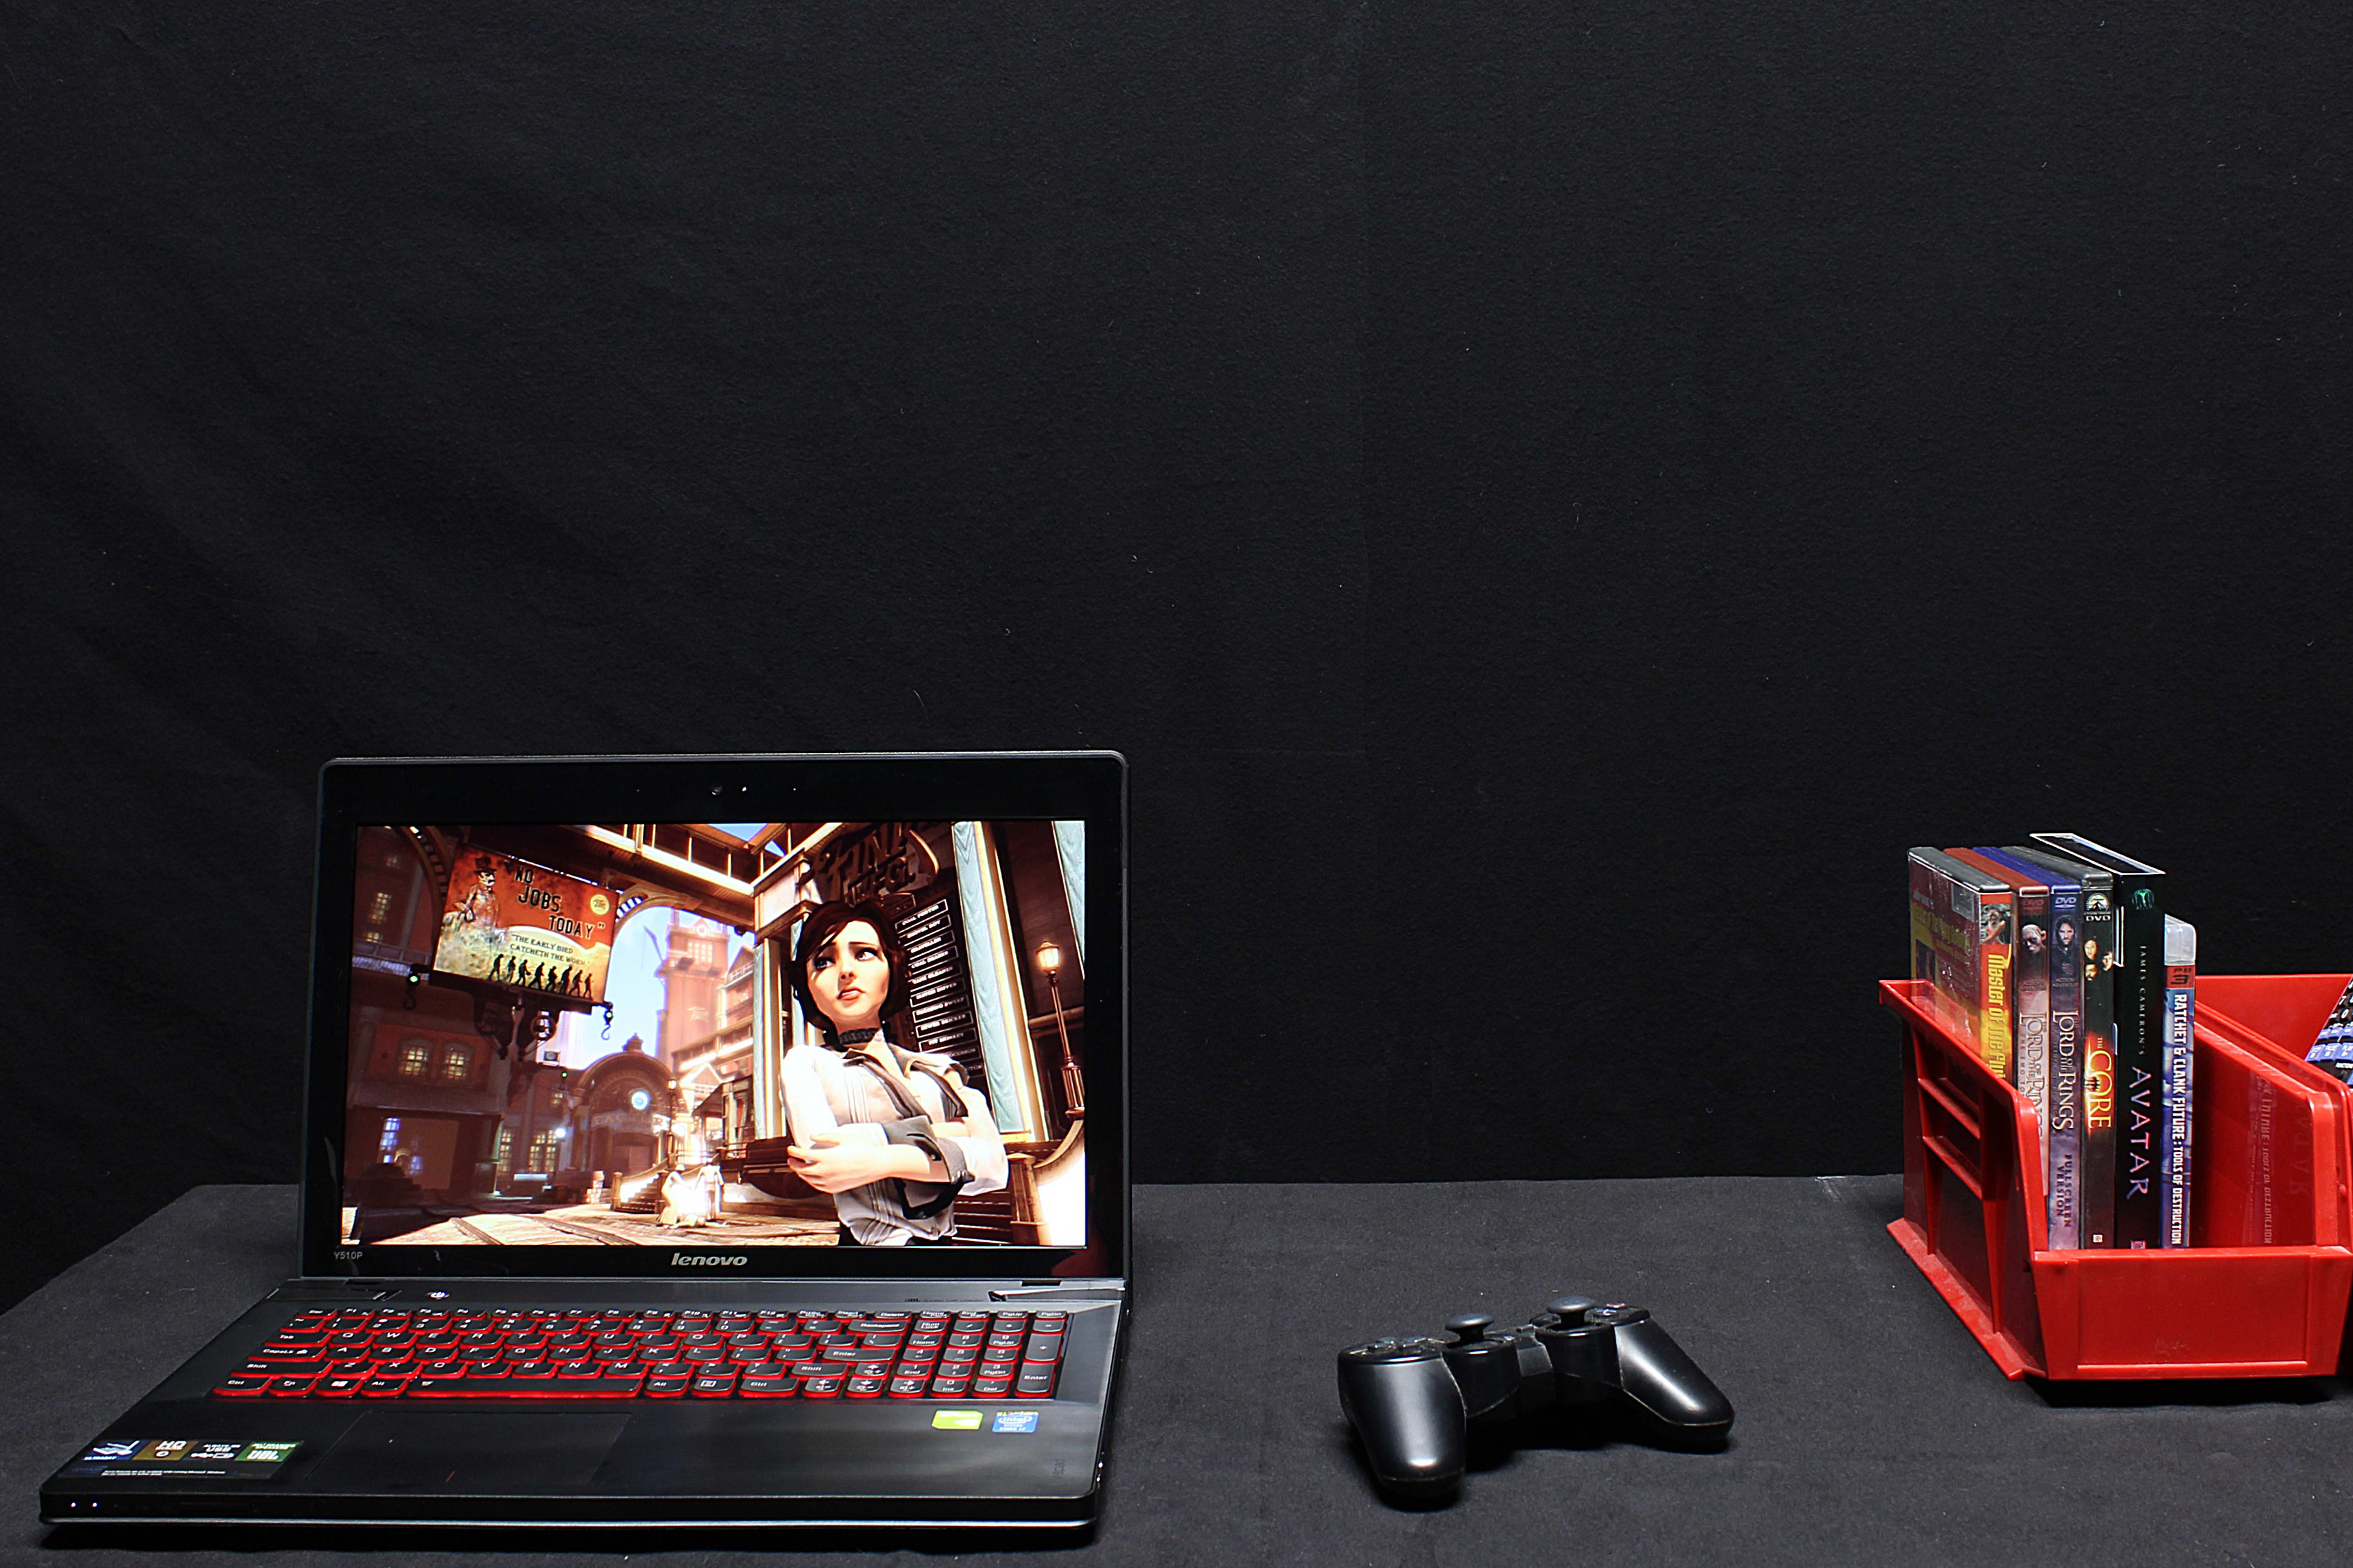 The Lenovo IdeaPad Y510p laptop